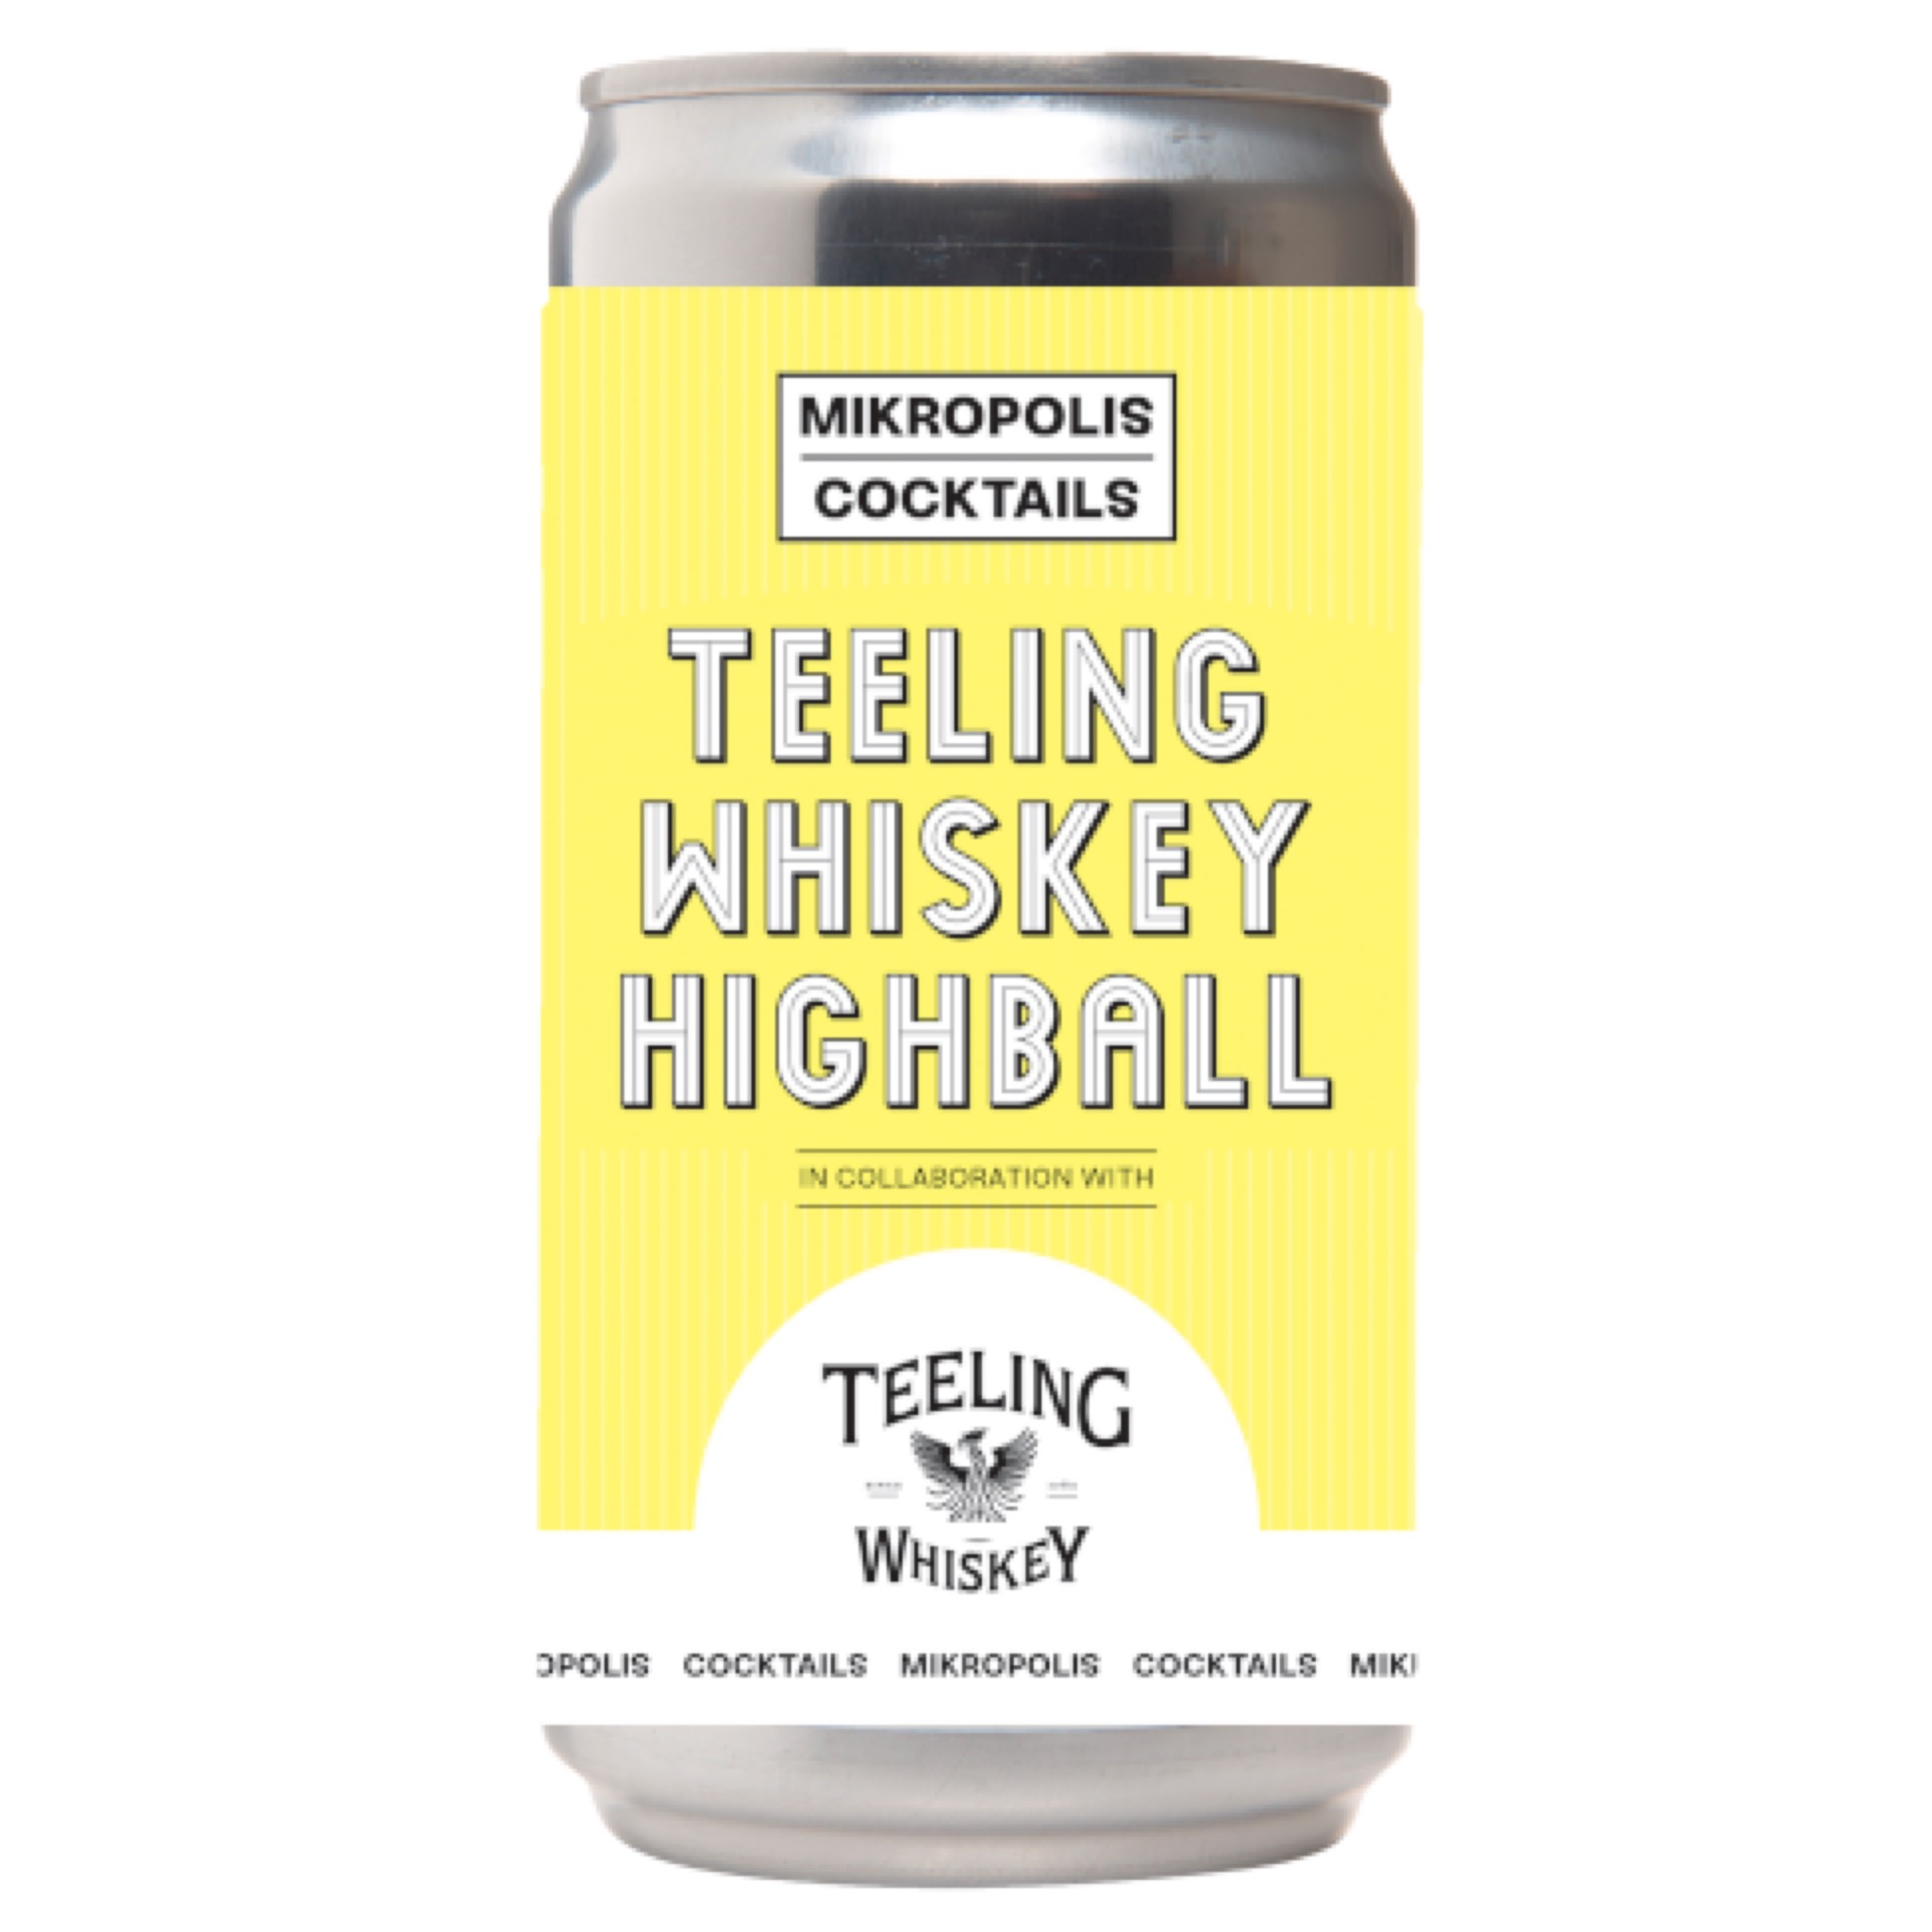 Teeling Whiskey Highball 9.4% 250ml Mikropolis Cocktails